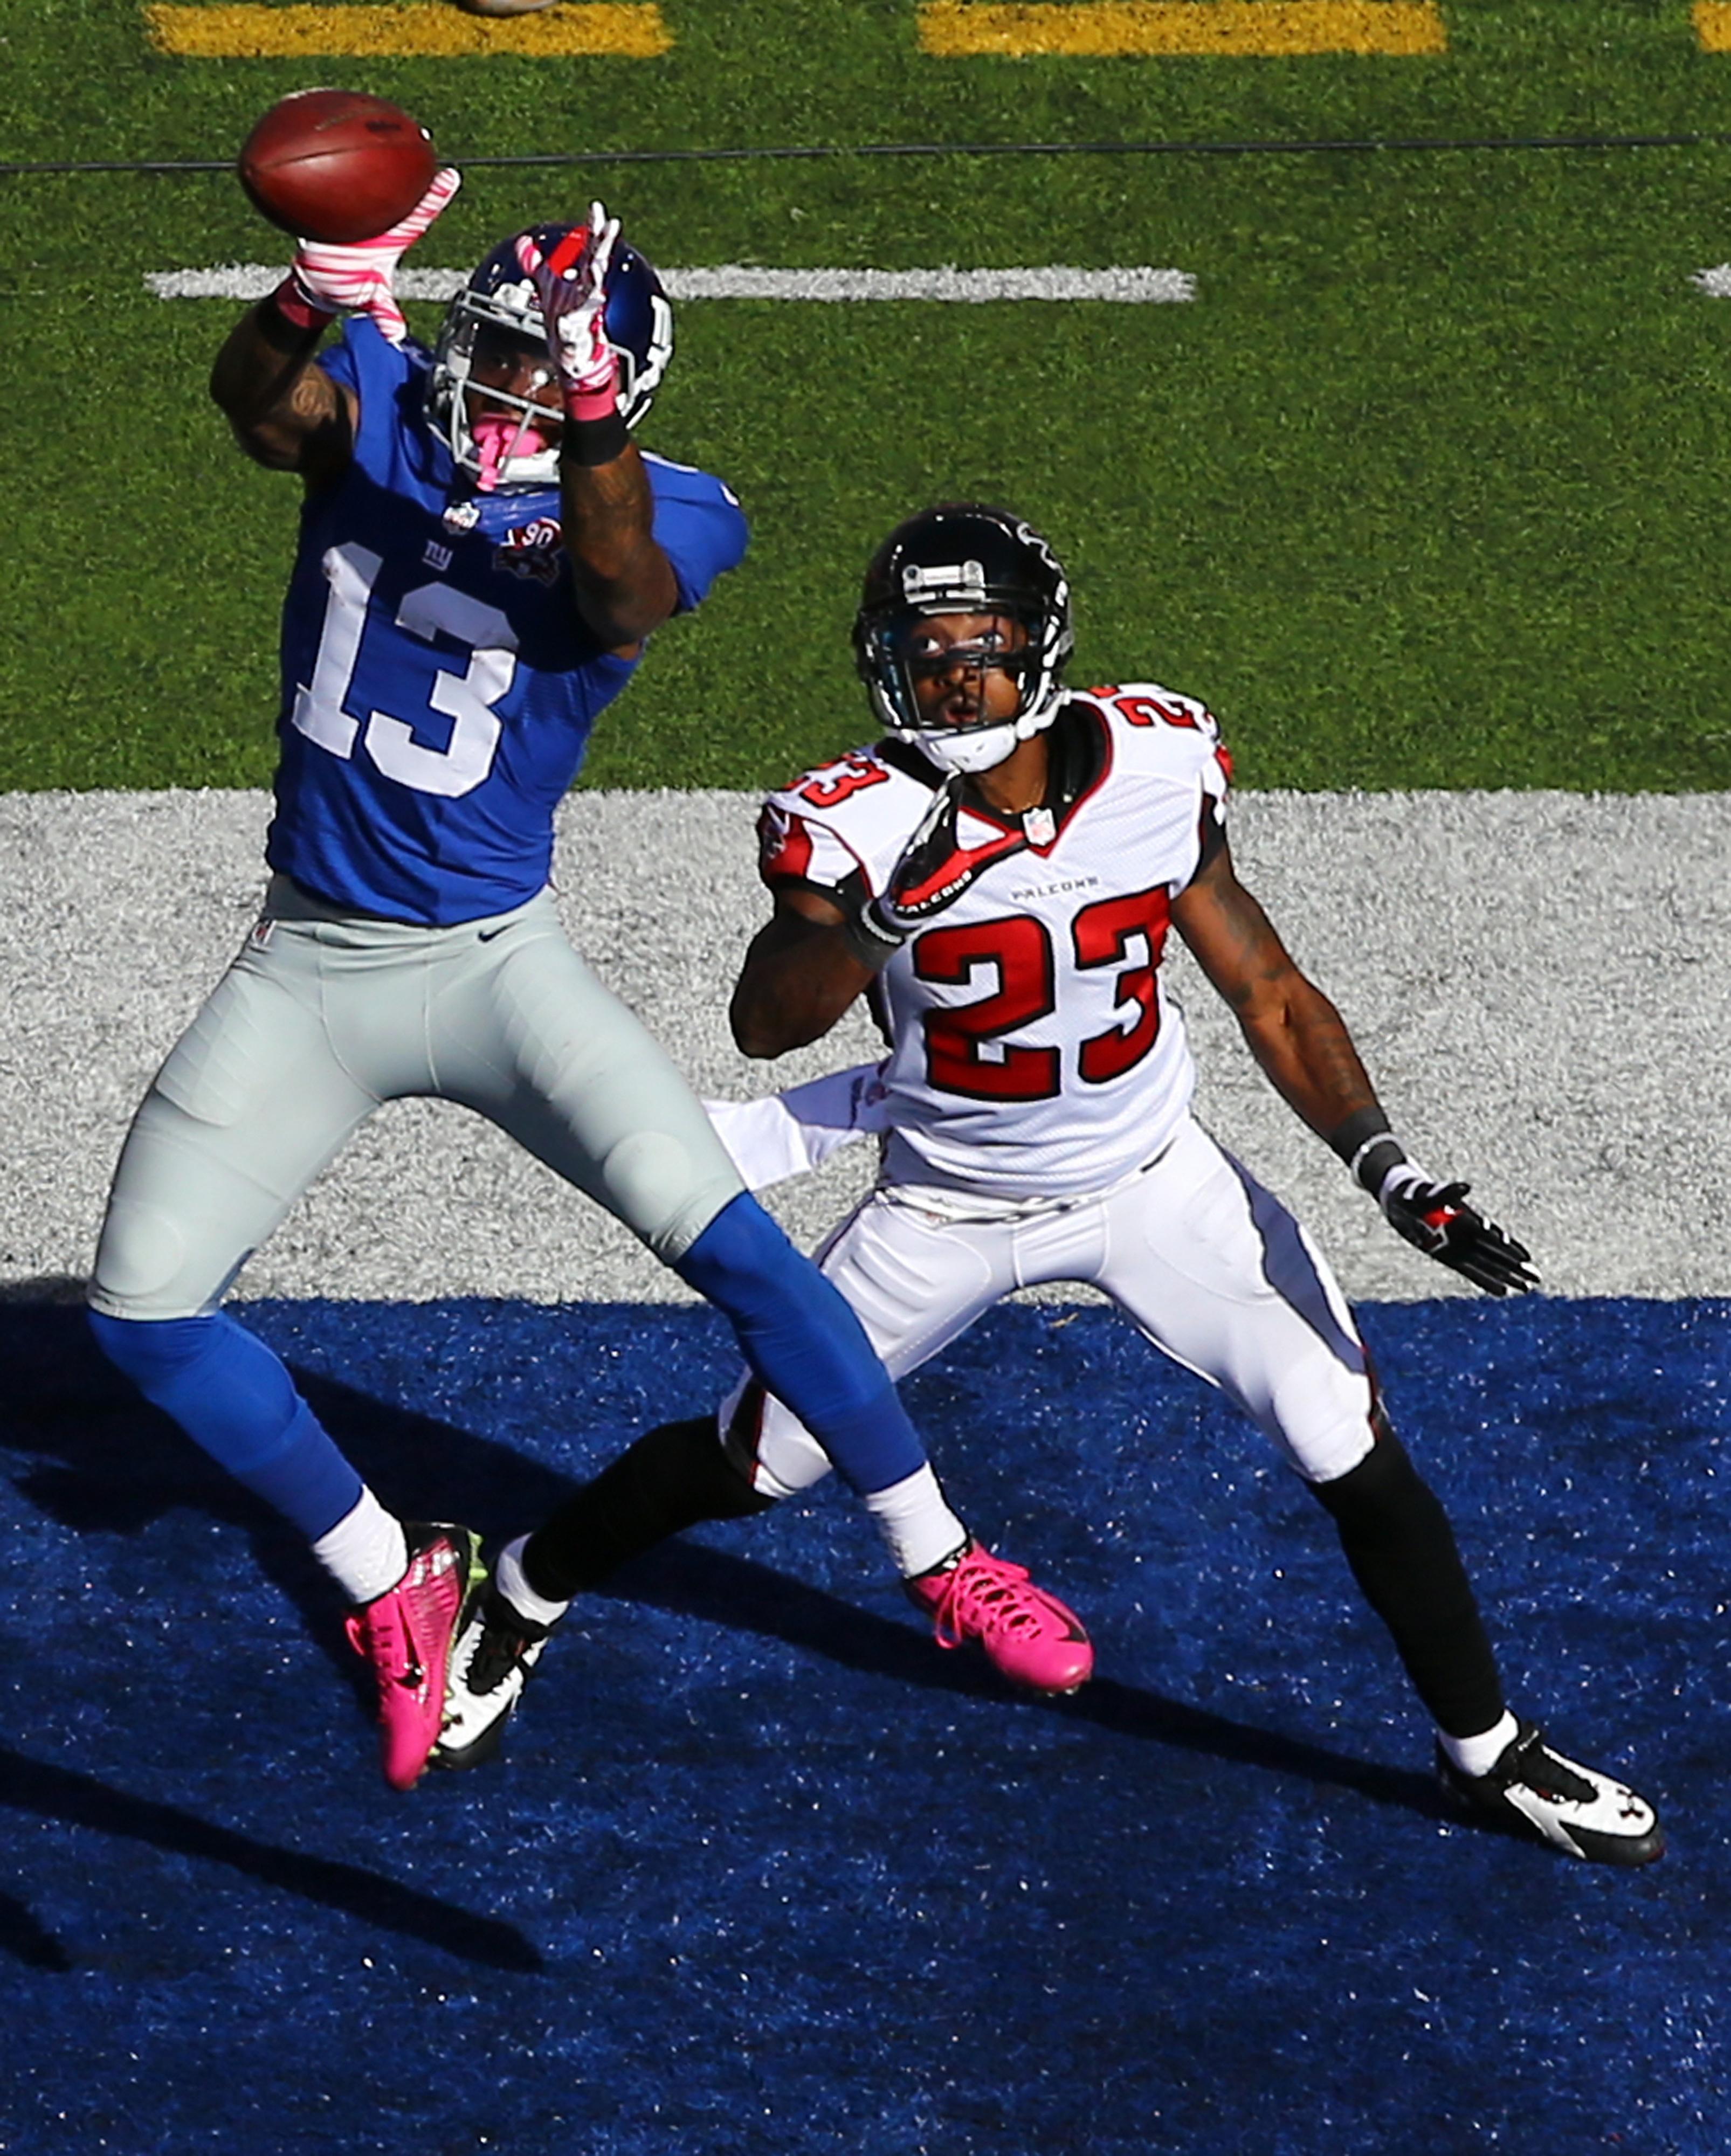 Odell Beckham catches his first career touchdown pass